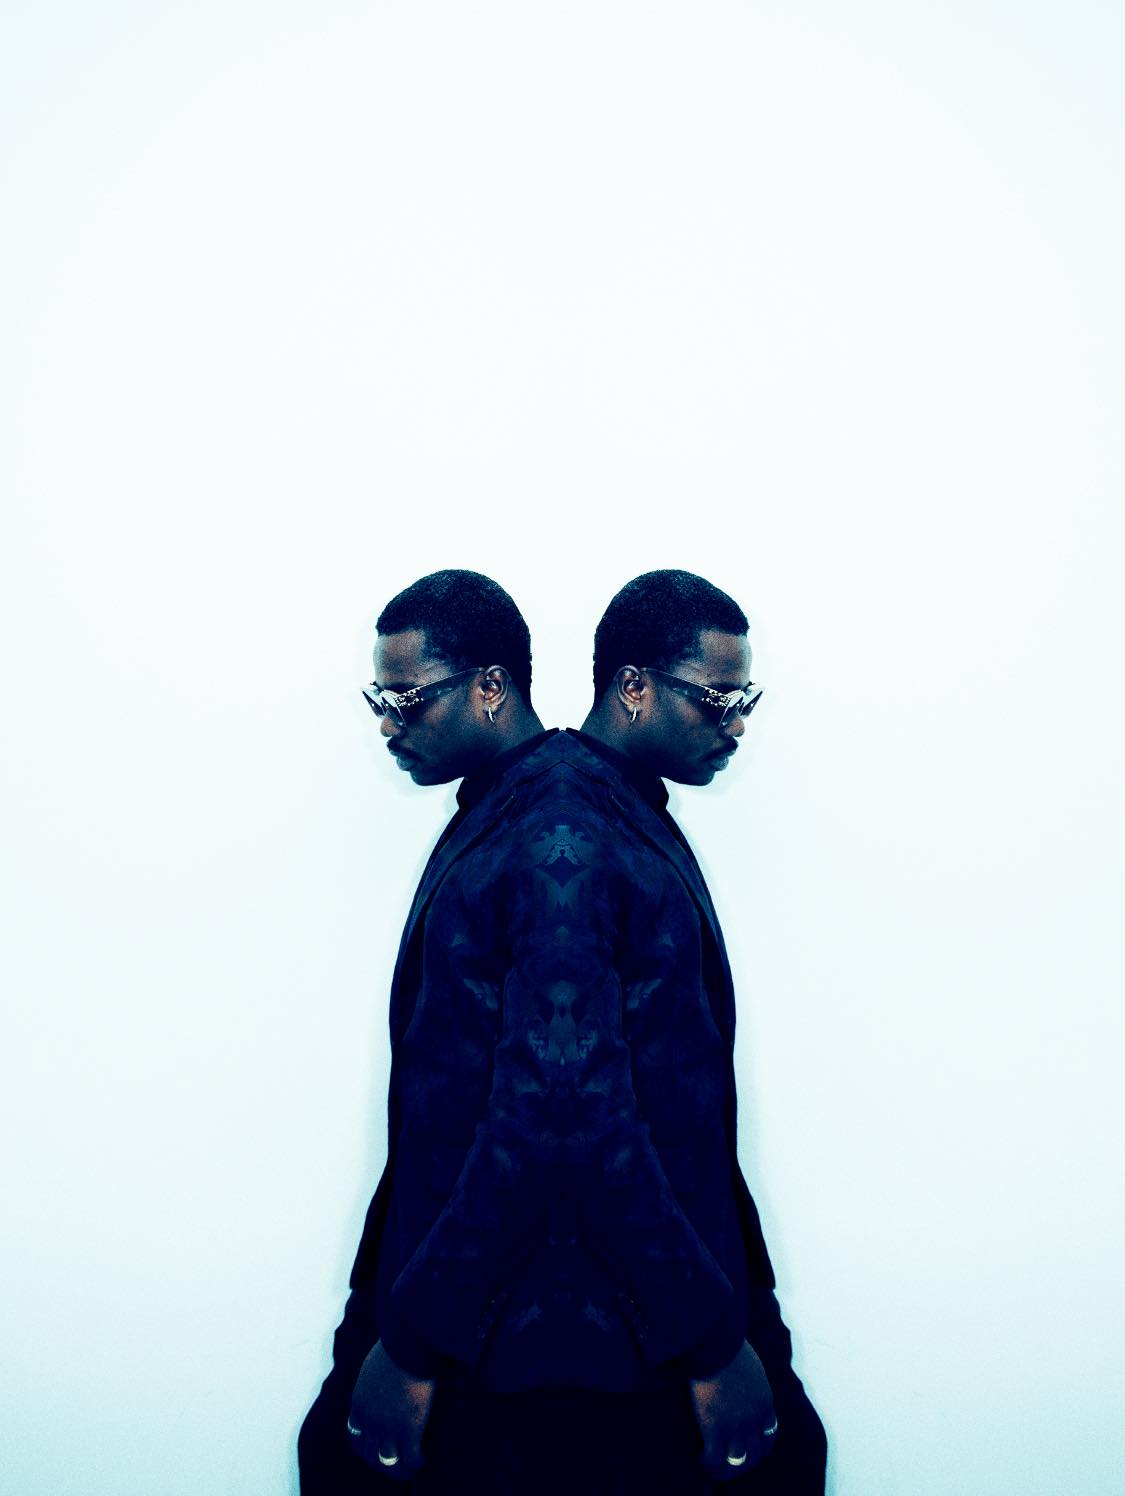 Darkovibes - Inna Song Remix Ft Stonebwoy (Prod. by Street Beatz)